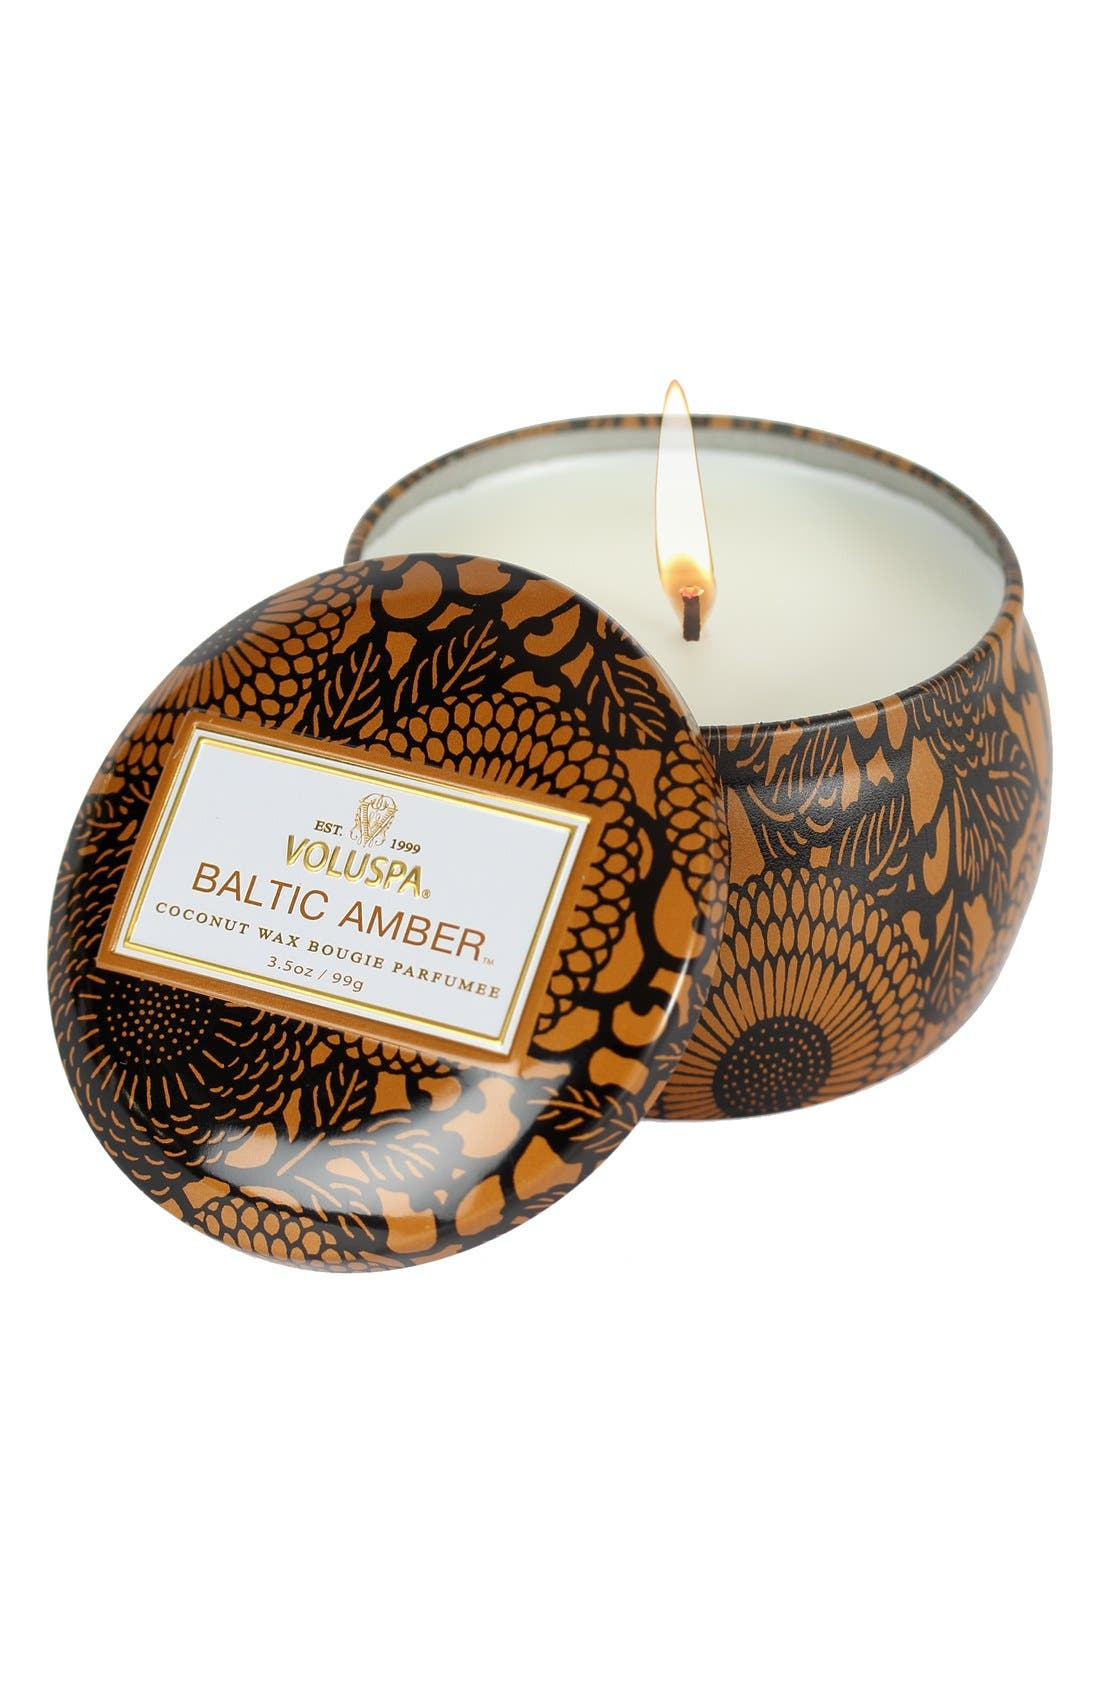 Alternate Image 1 Selected - Voluspa 'Japonica - Baltic Amber' Petite Decorative Candle